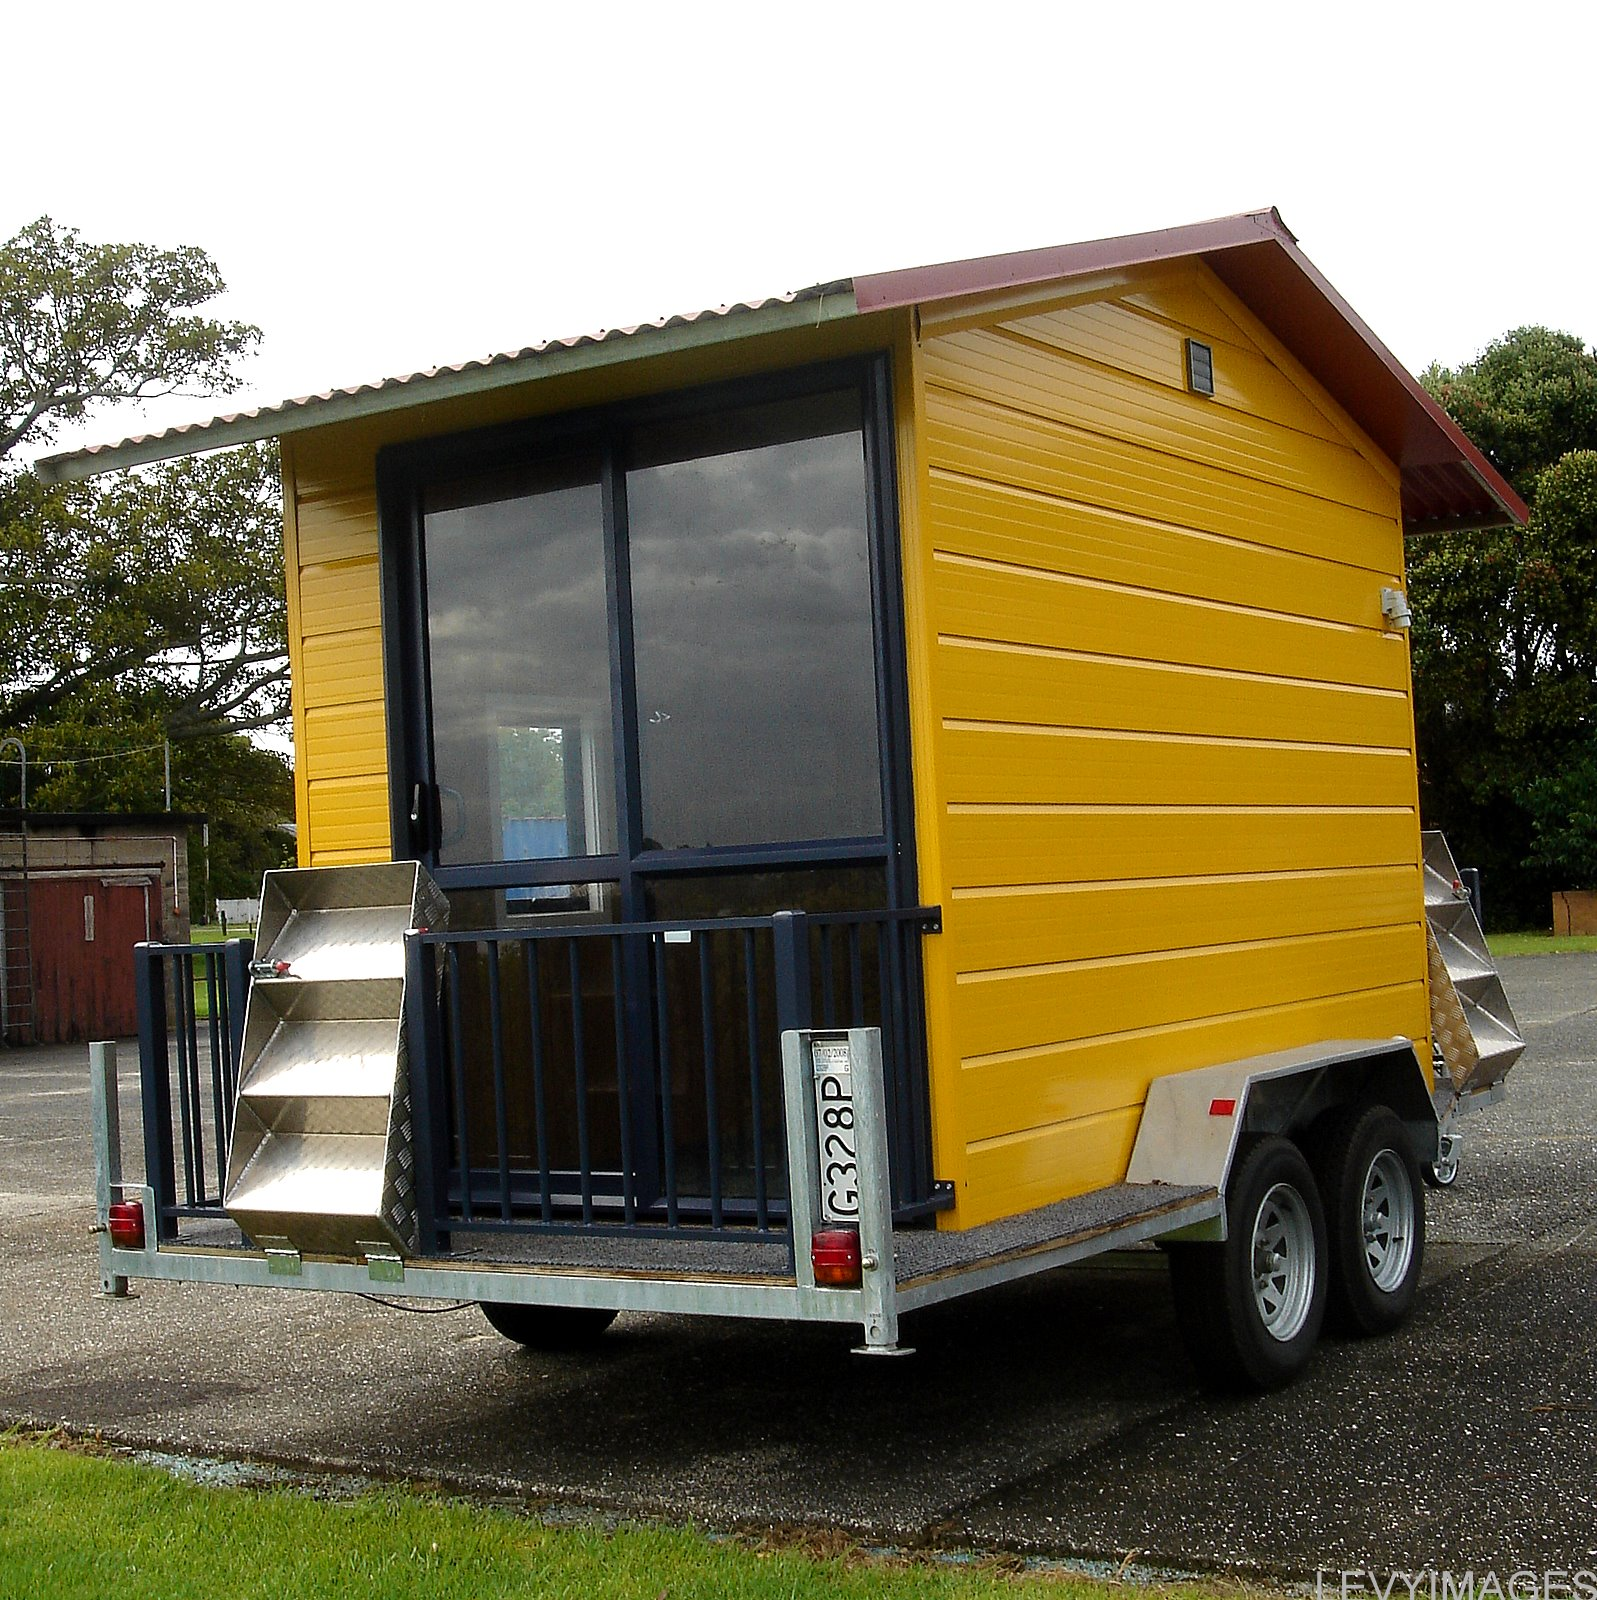 The Flying Tortoise: Tiny House On Wheels